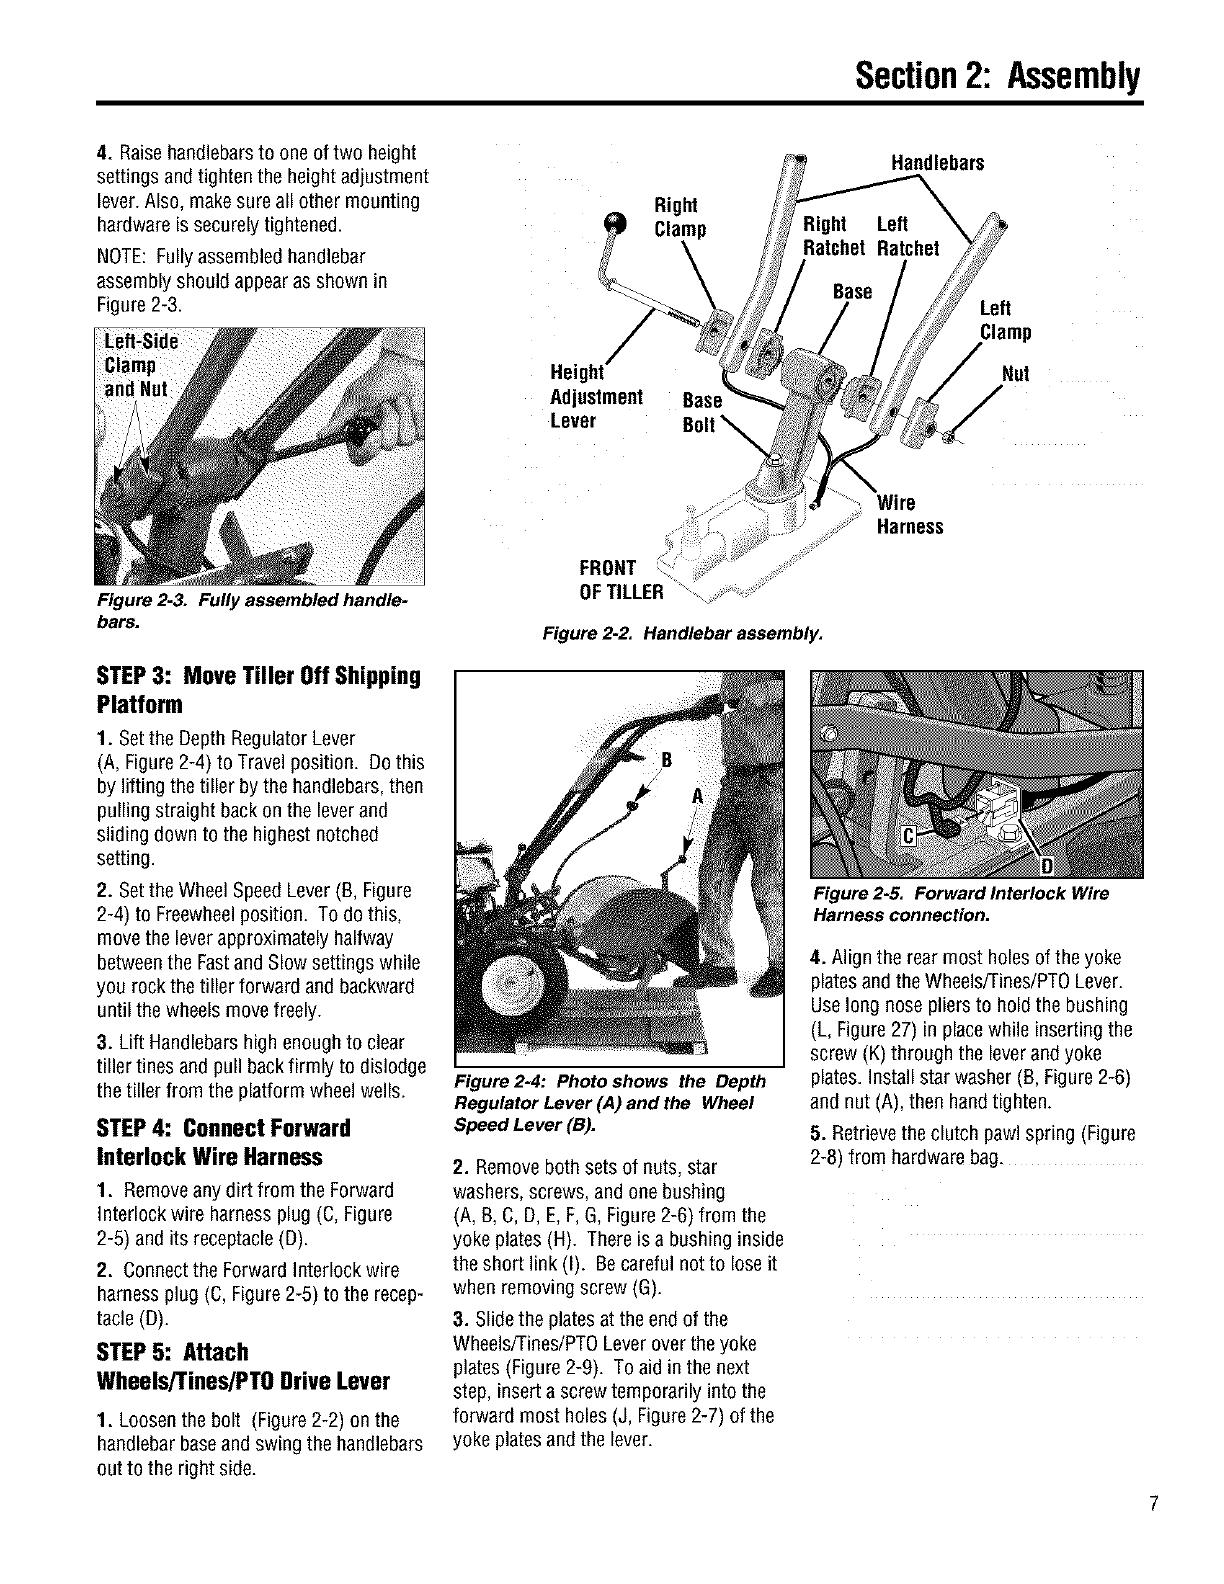 Troybilt 21A 682J063 User Manual TILLER Manuals And Guides